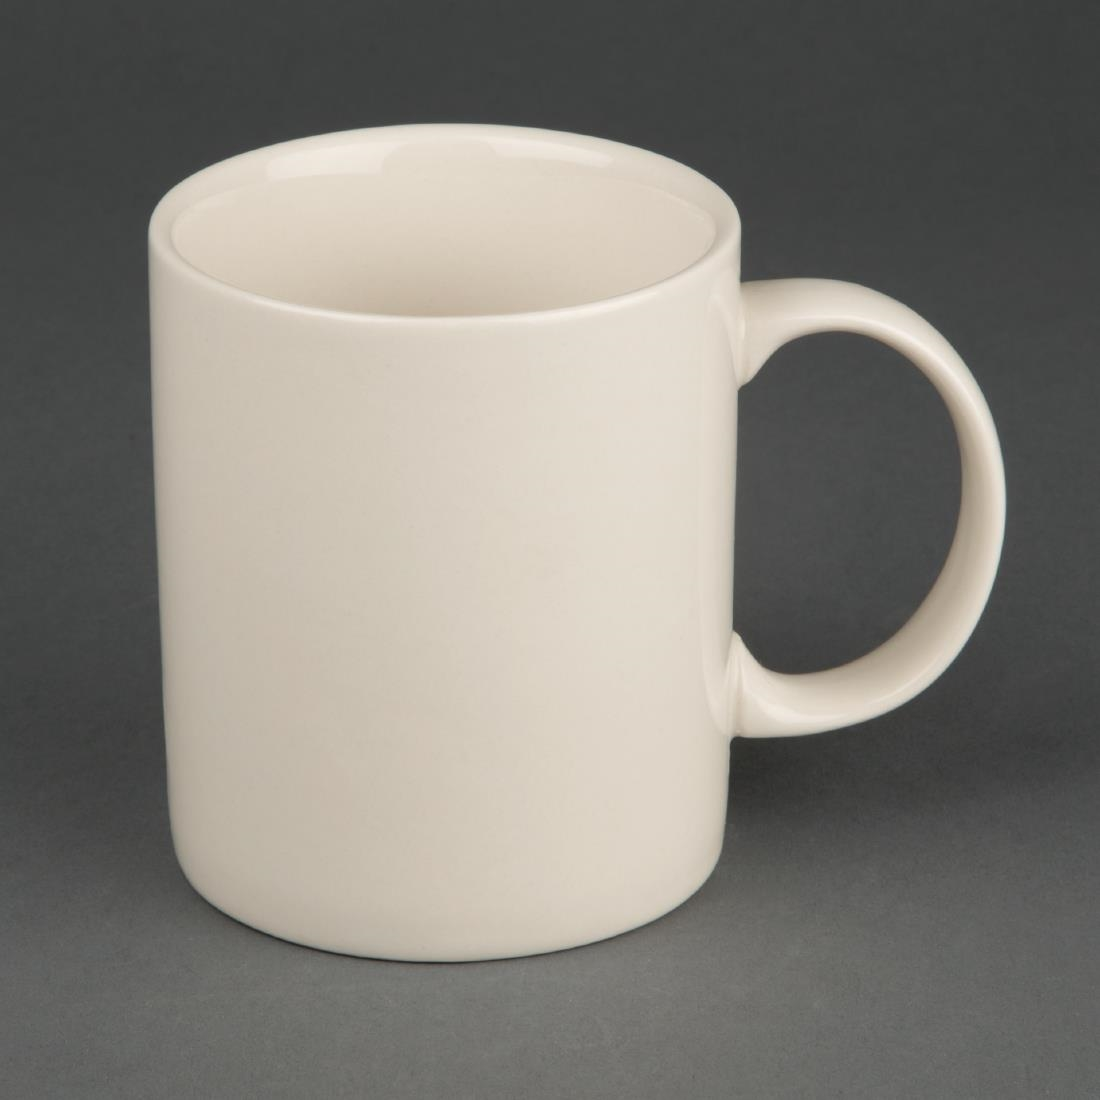 Olympia Ivory Mugs 284ml 10oz (Pack of 12)